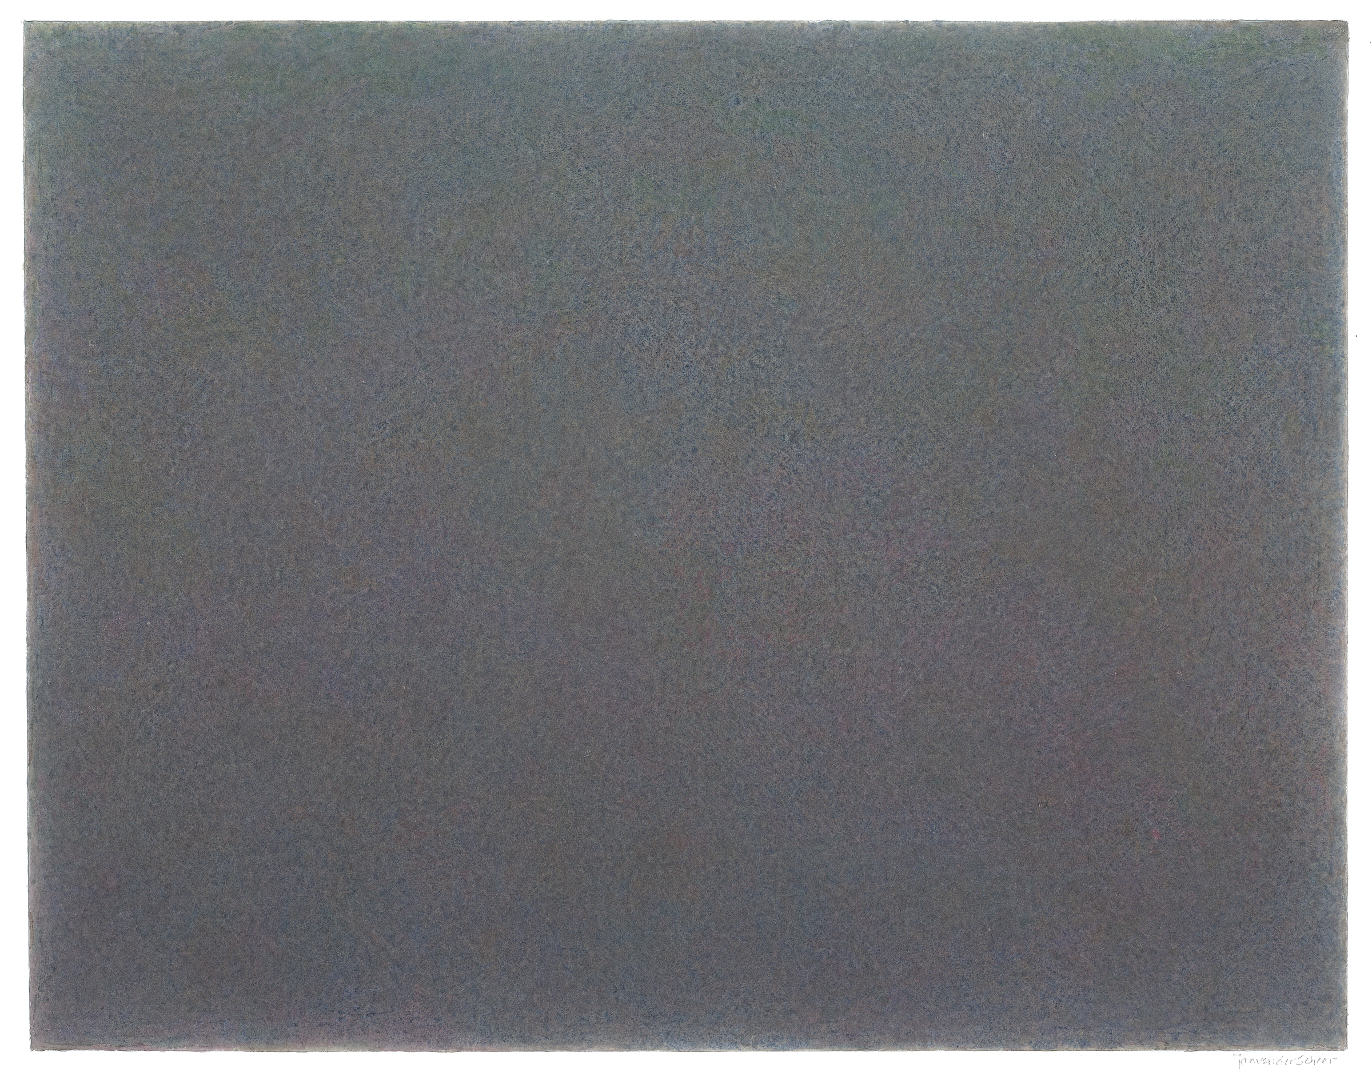 2015 Donkere ruimte (47 X 60 cm) 19646